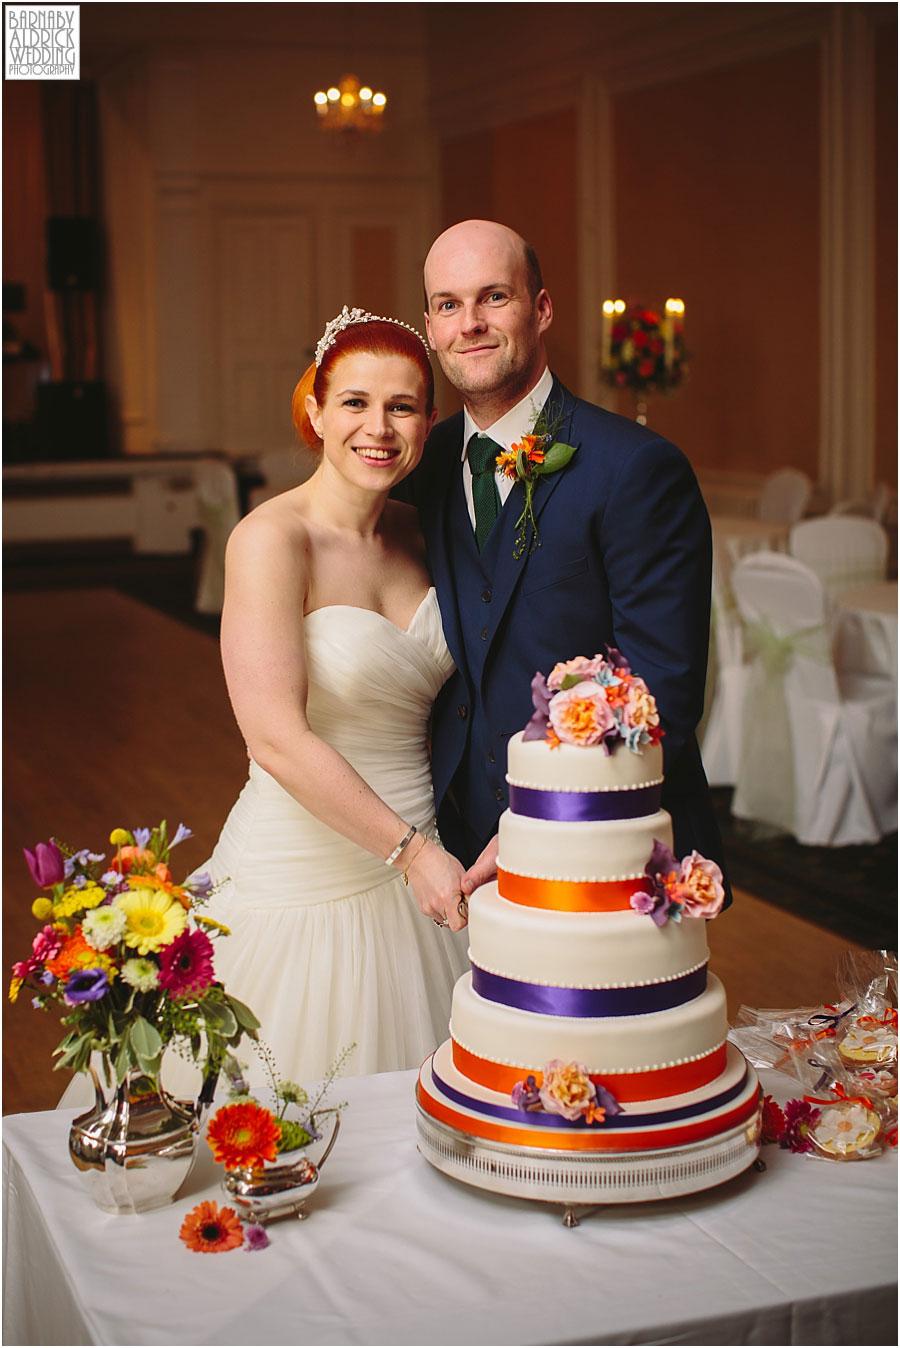 The Old Swan Harrogate Wedding Photography 054.jpg